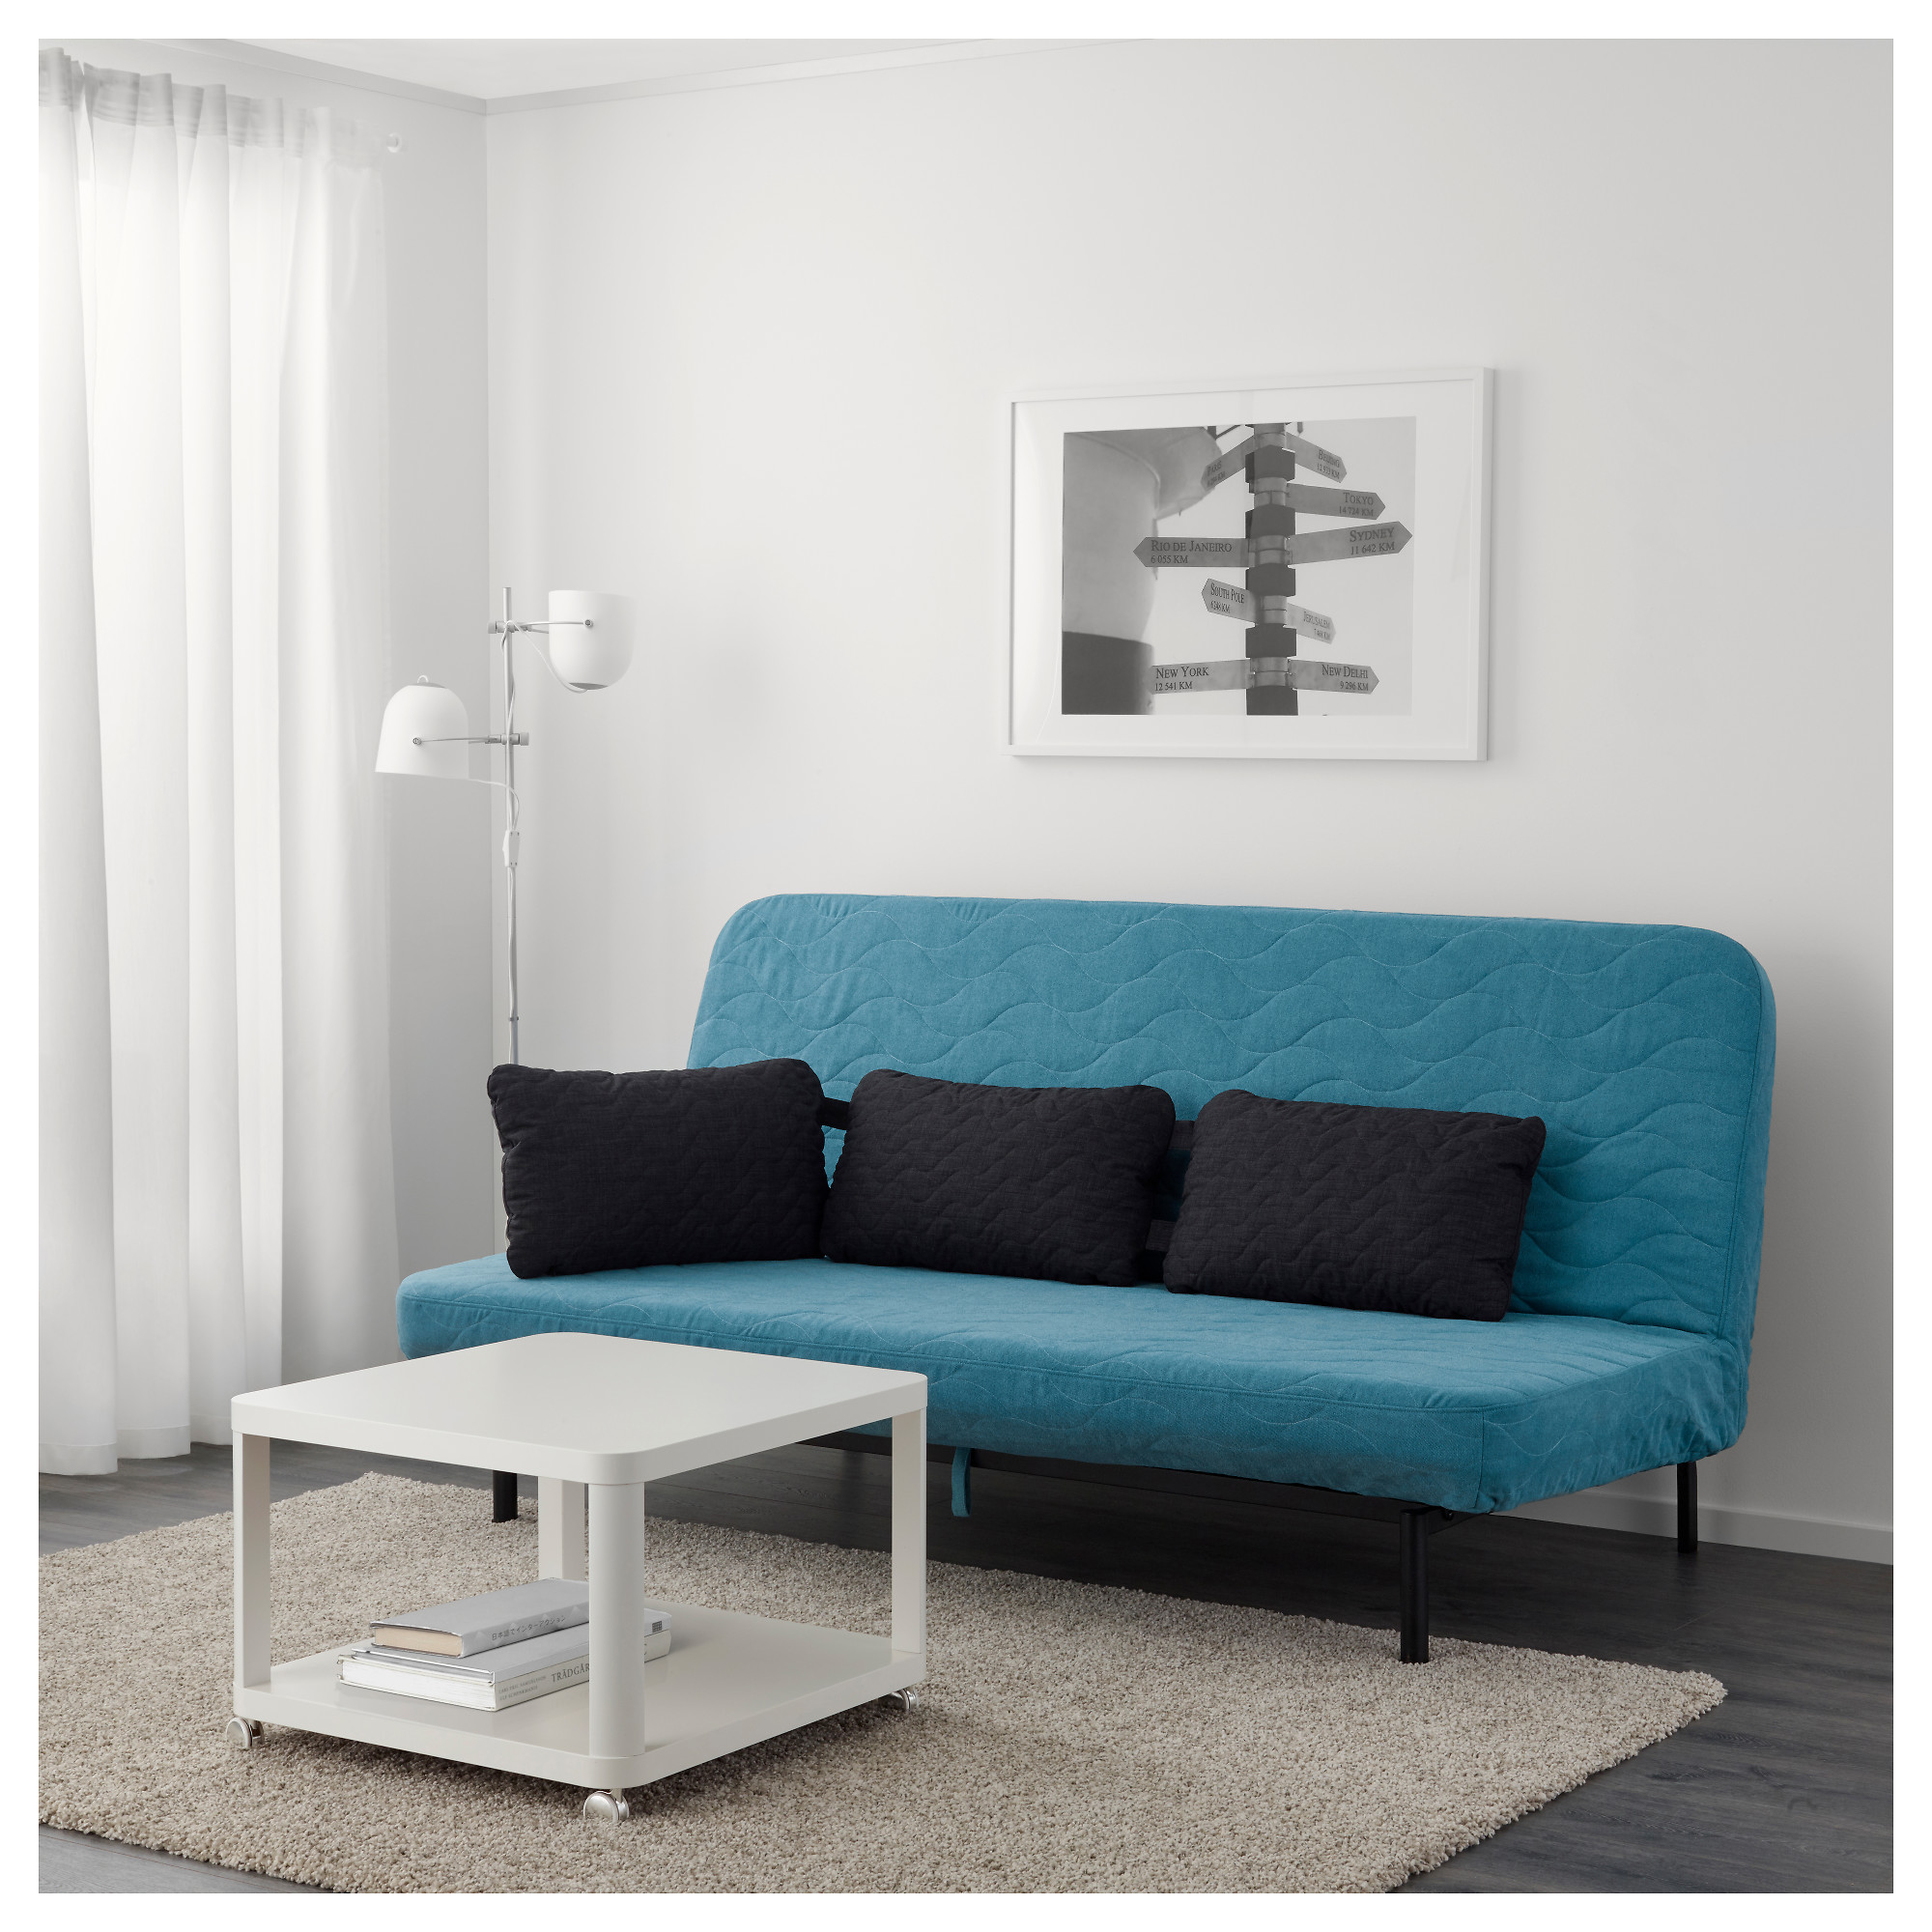 Ikea Lithuania Shop For Furniture Lighting Home